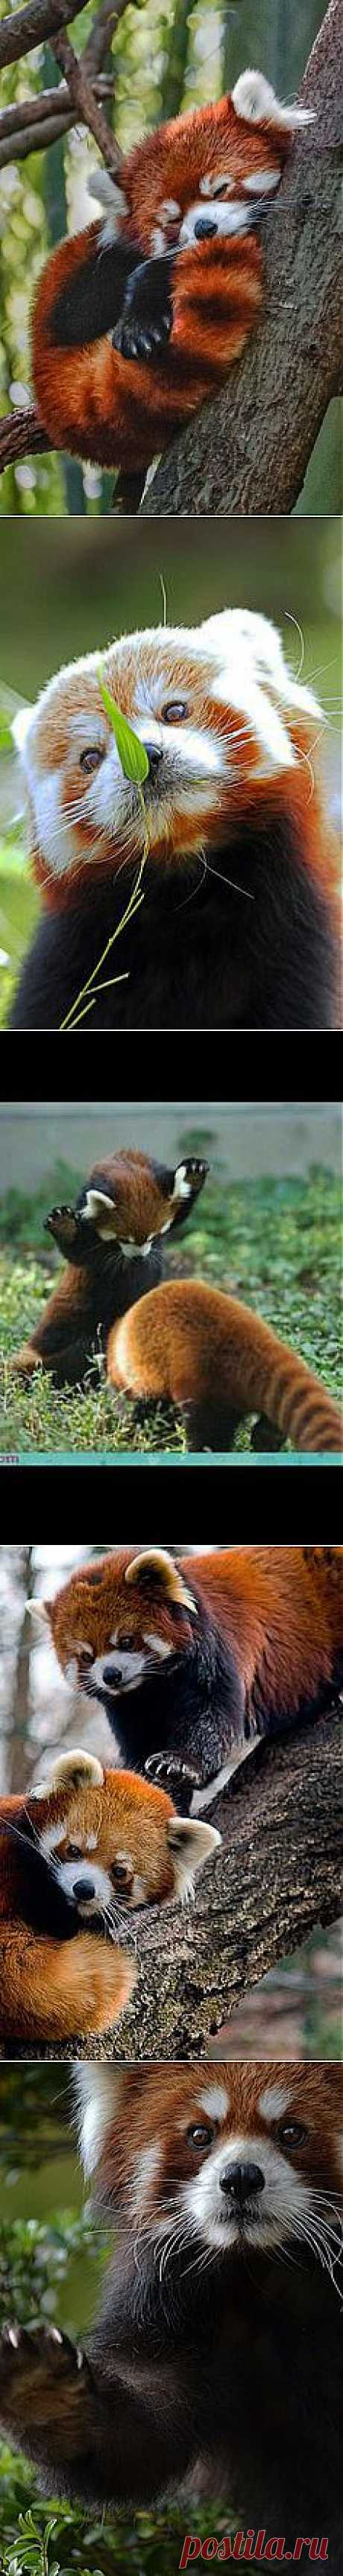 Red Panda | Animals